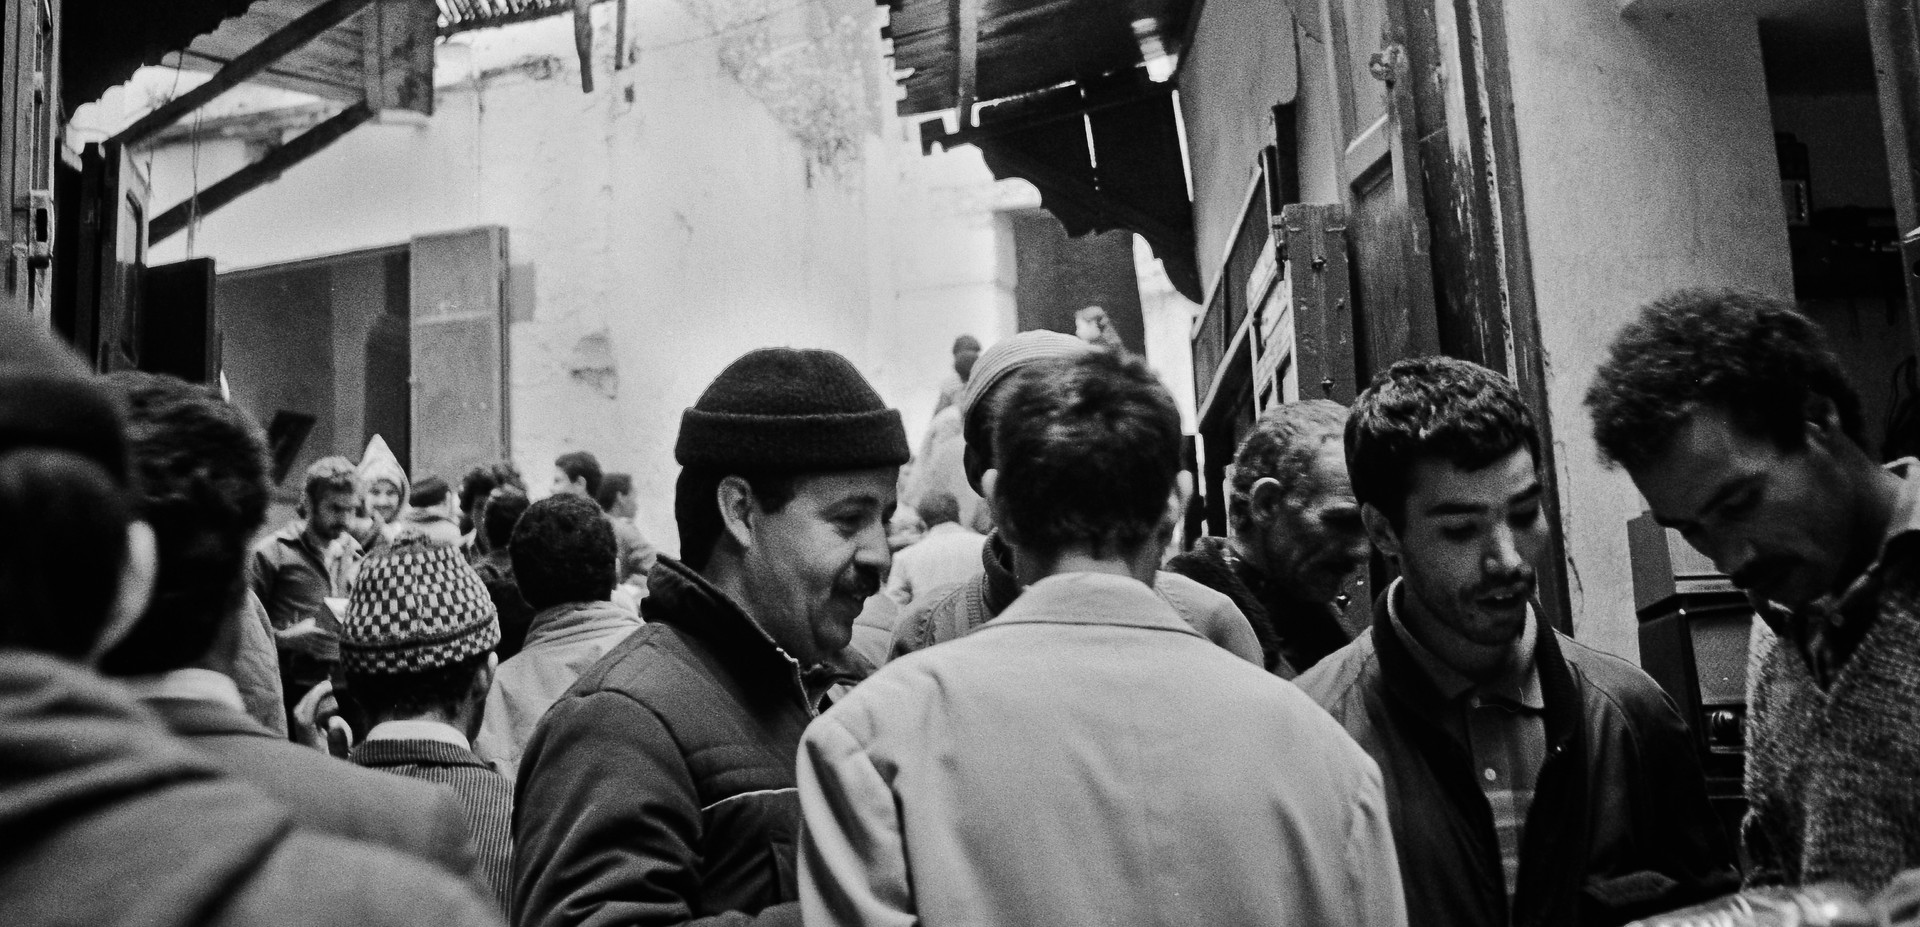 Istanbul, Turkey 1987